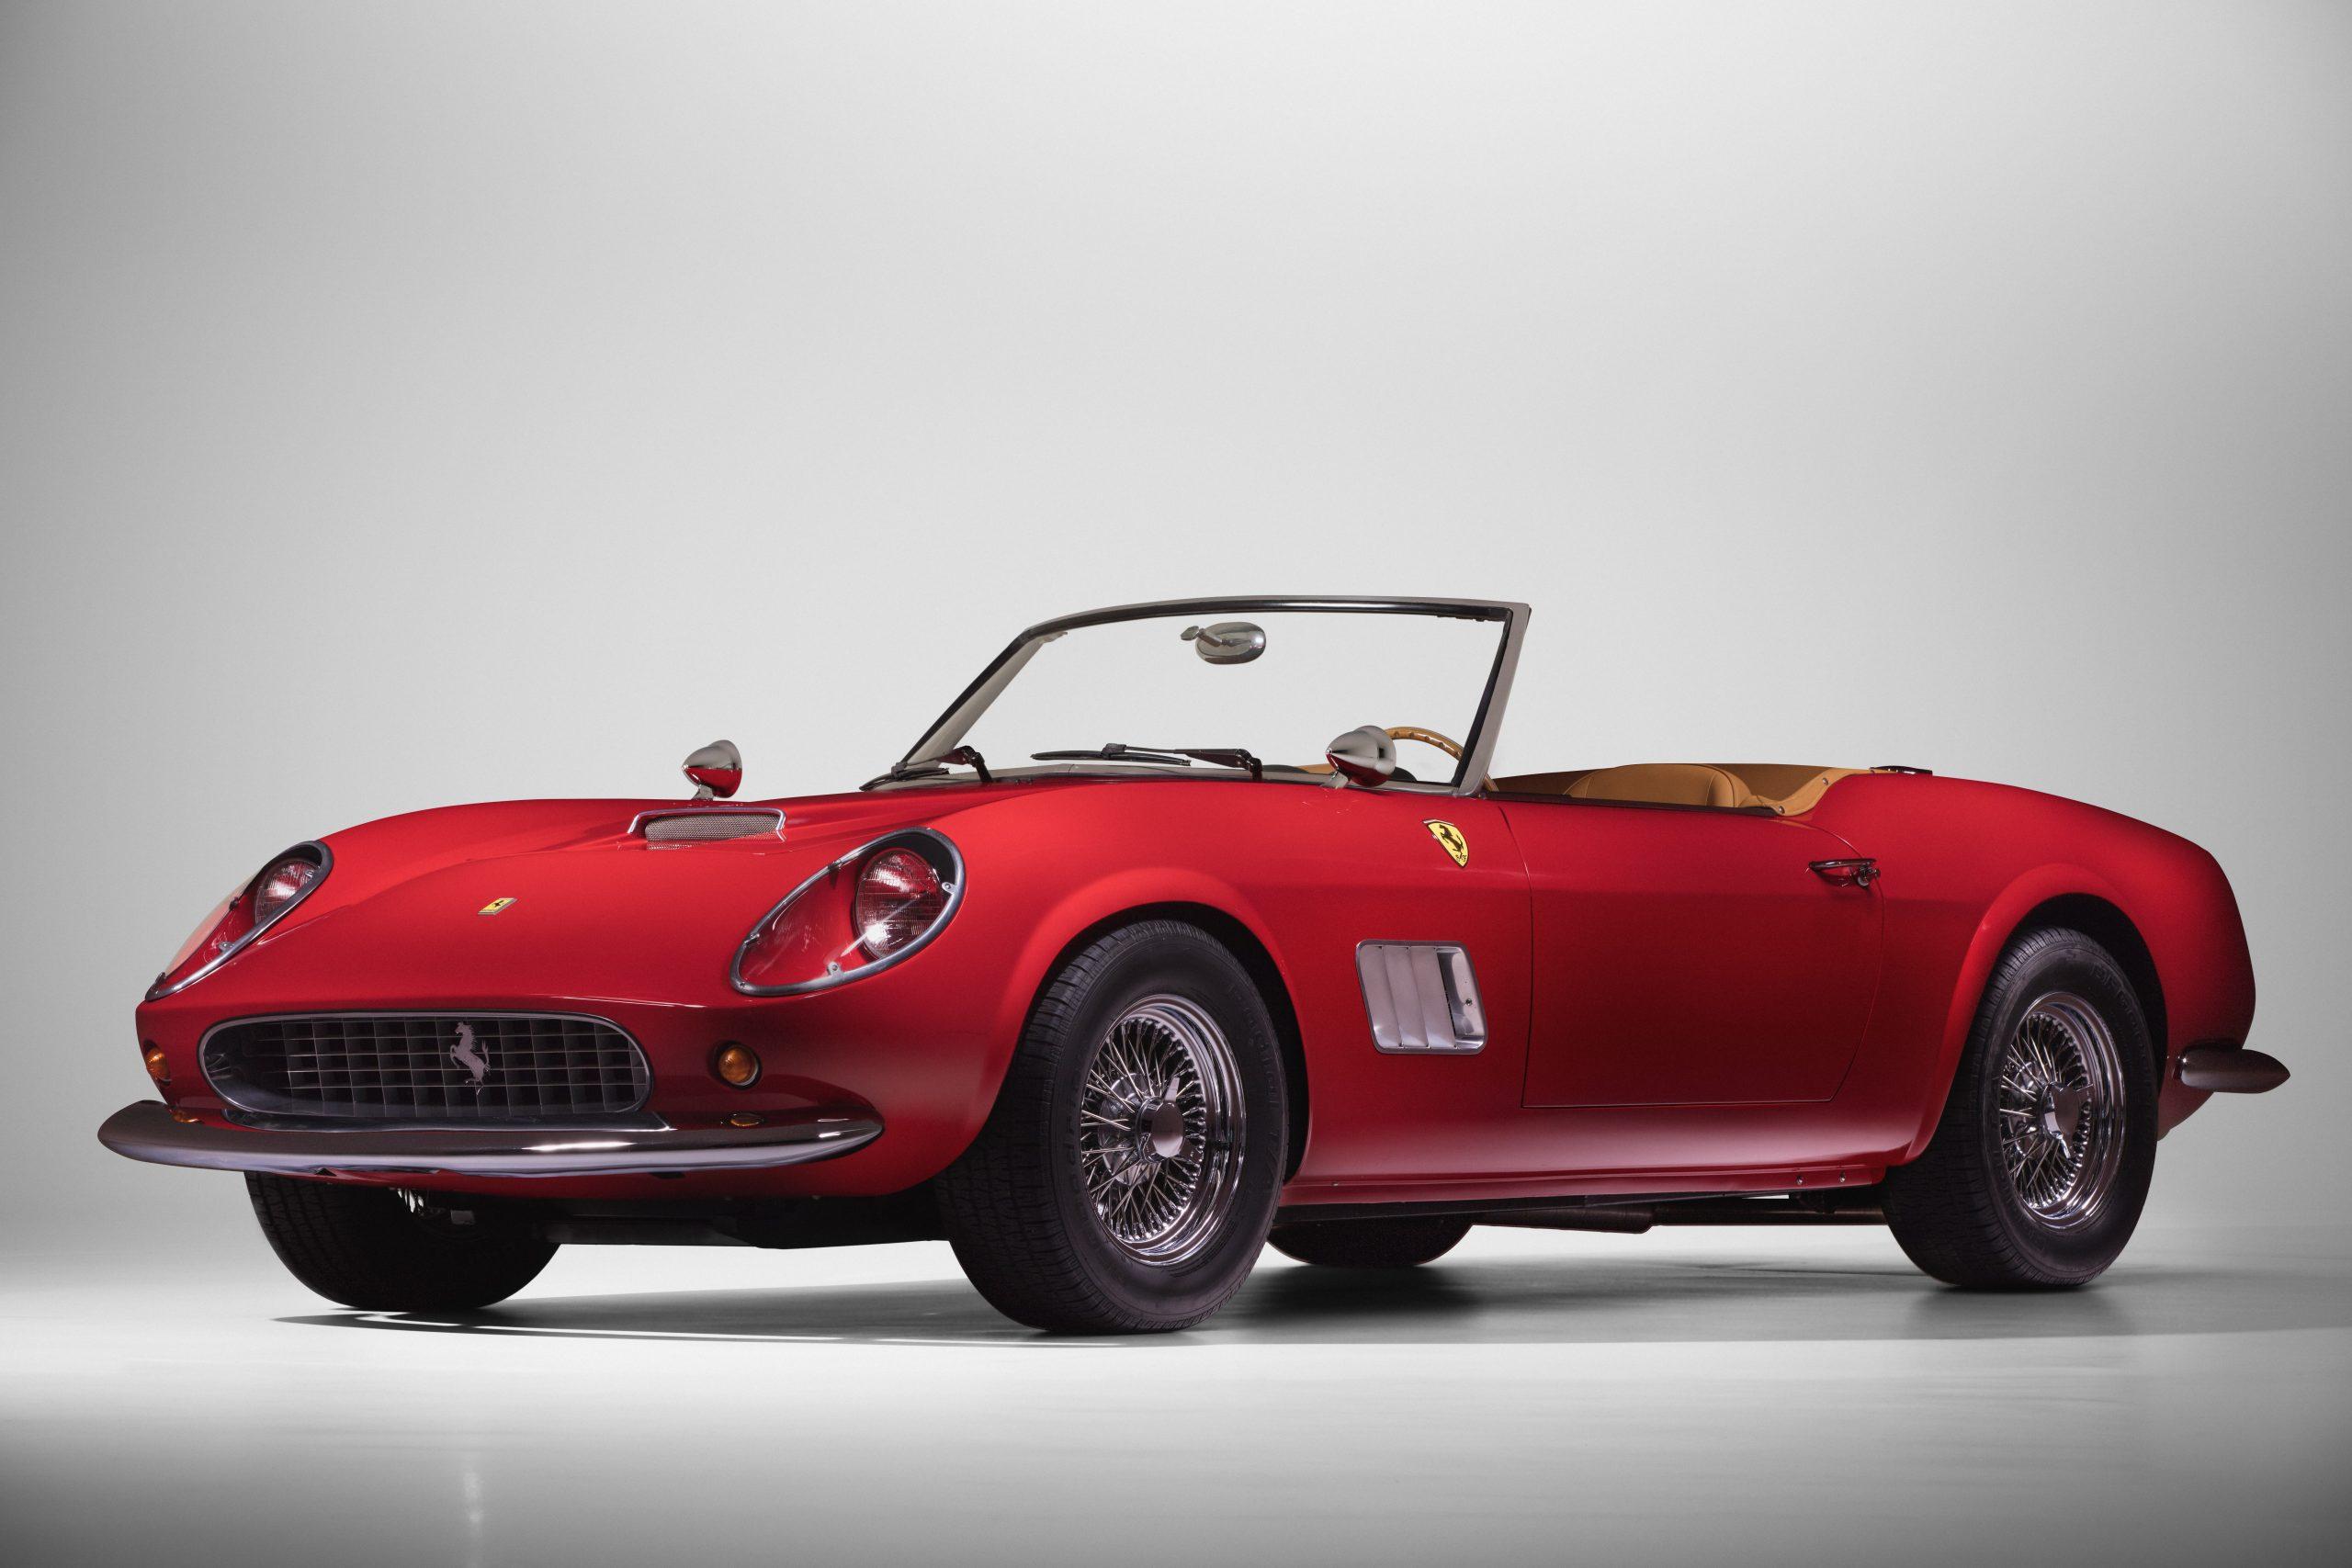 Ferris Bueller Ferrari - HVA Studio drivers side angle